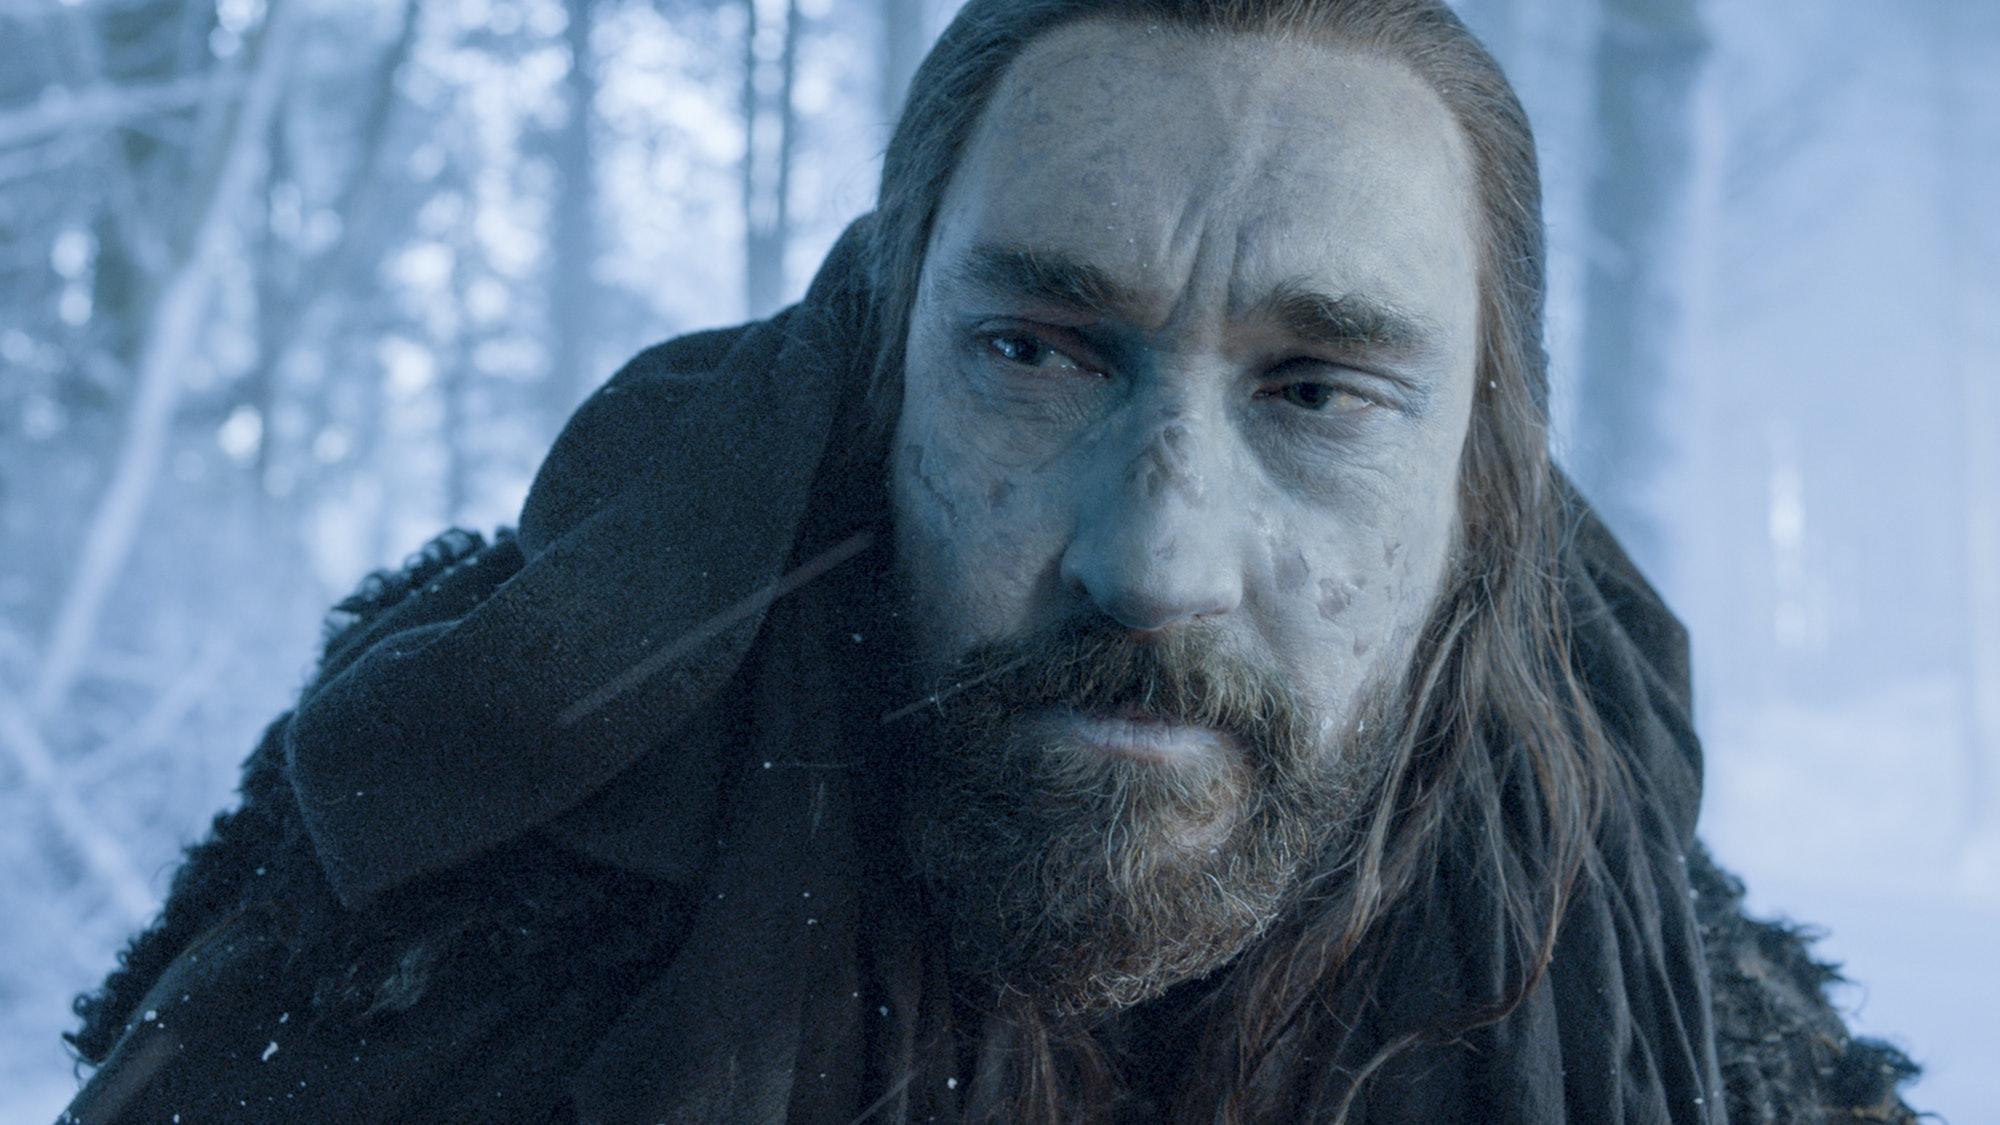 How would Valyrian steel impact an undead Benjen Stark?